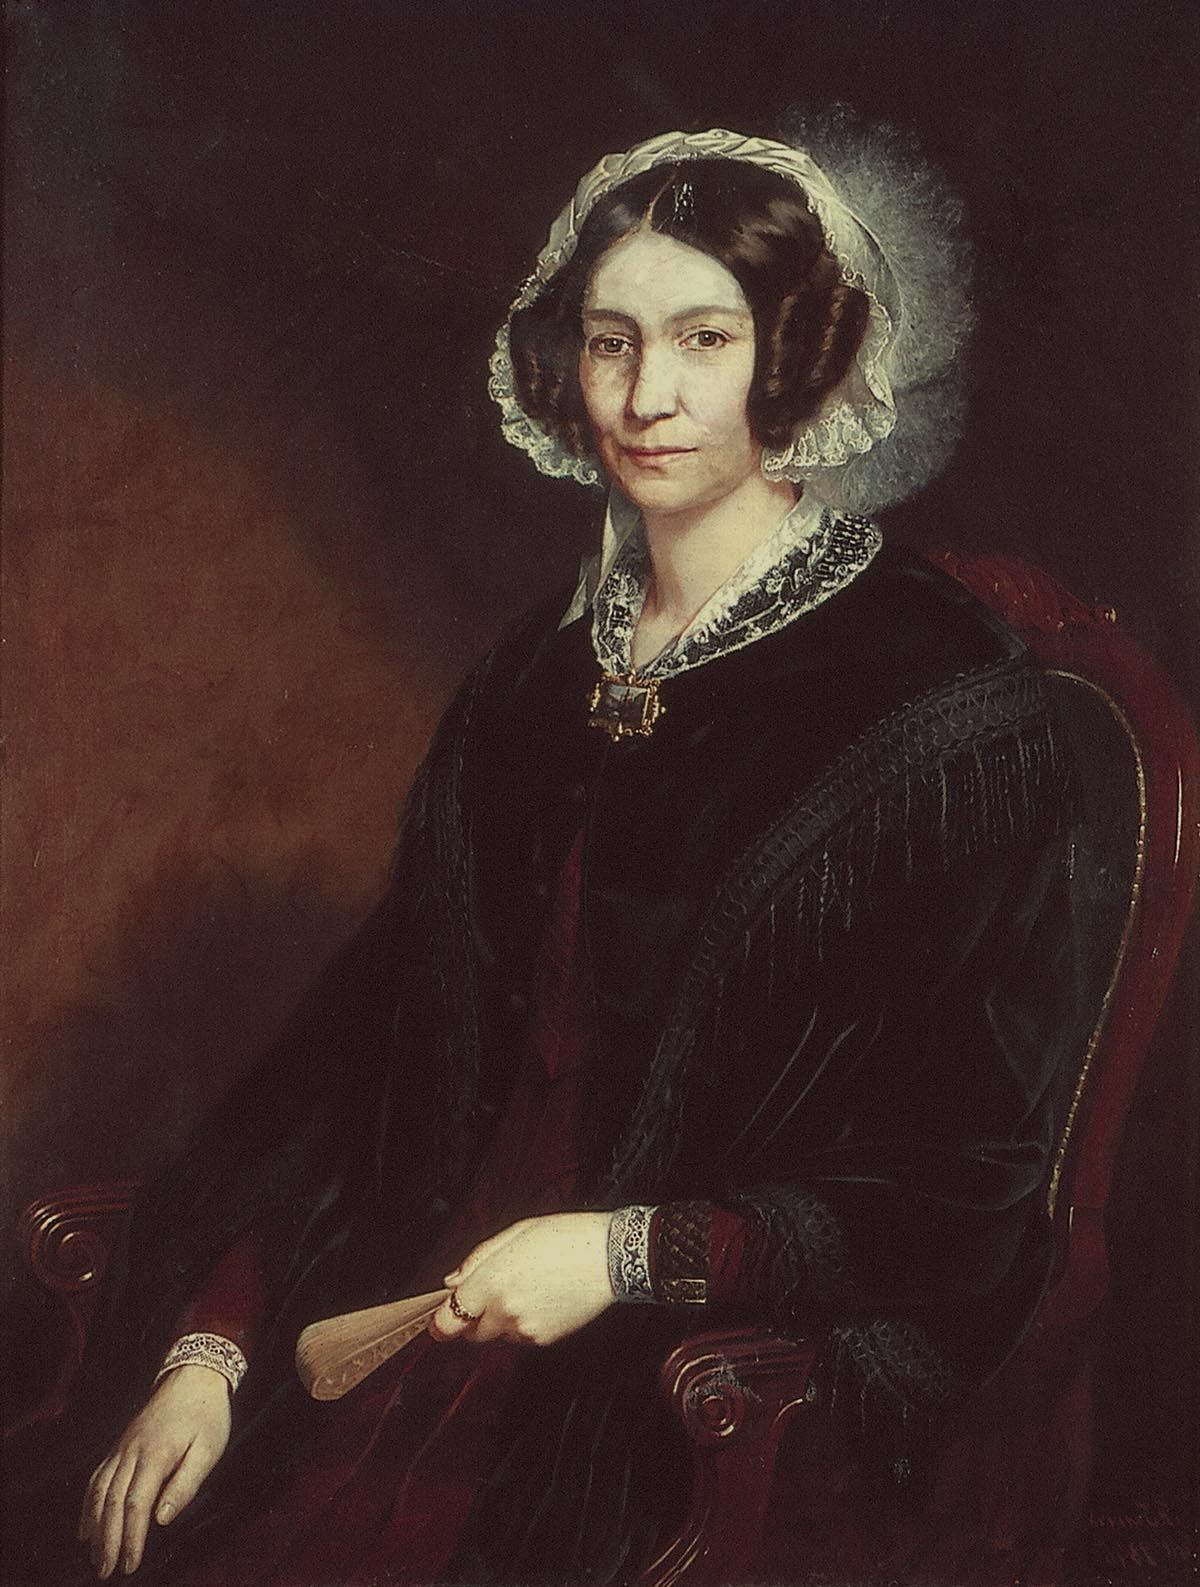 Russie of Rusje Boogaerdt (1782-1859)